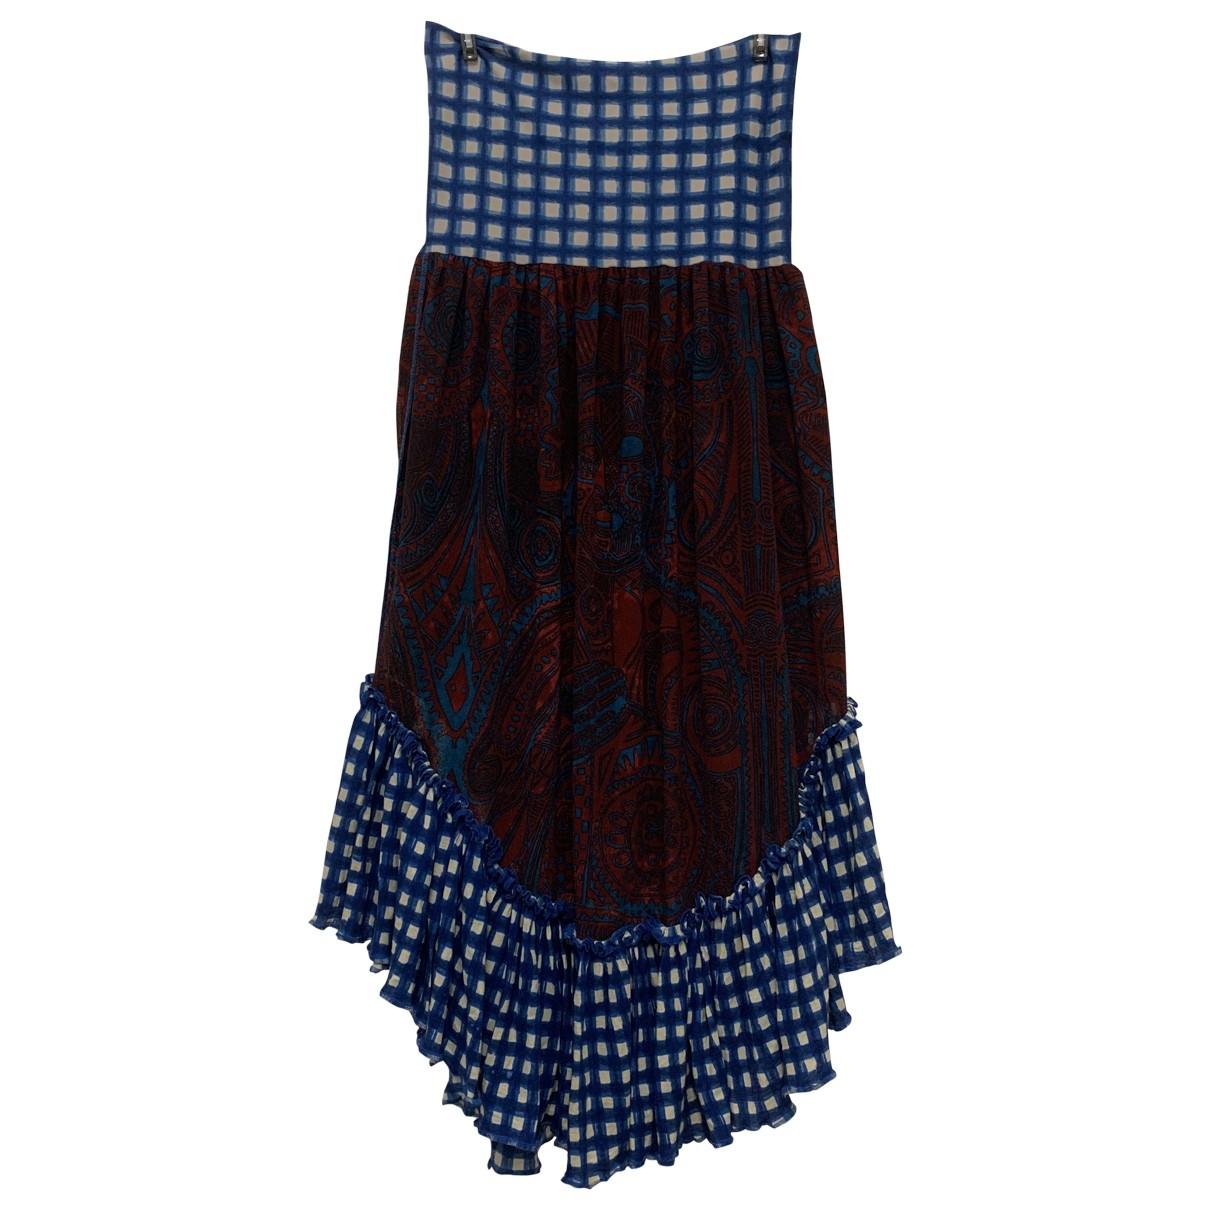 Jean Paul Gaultier \N Multicolour skirt for Women M International